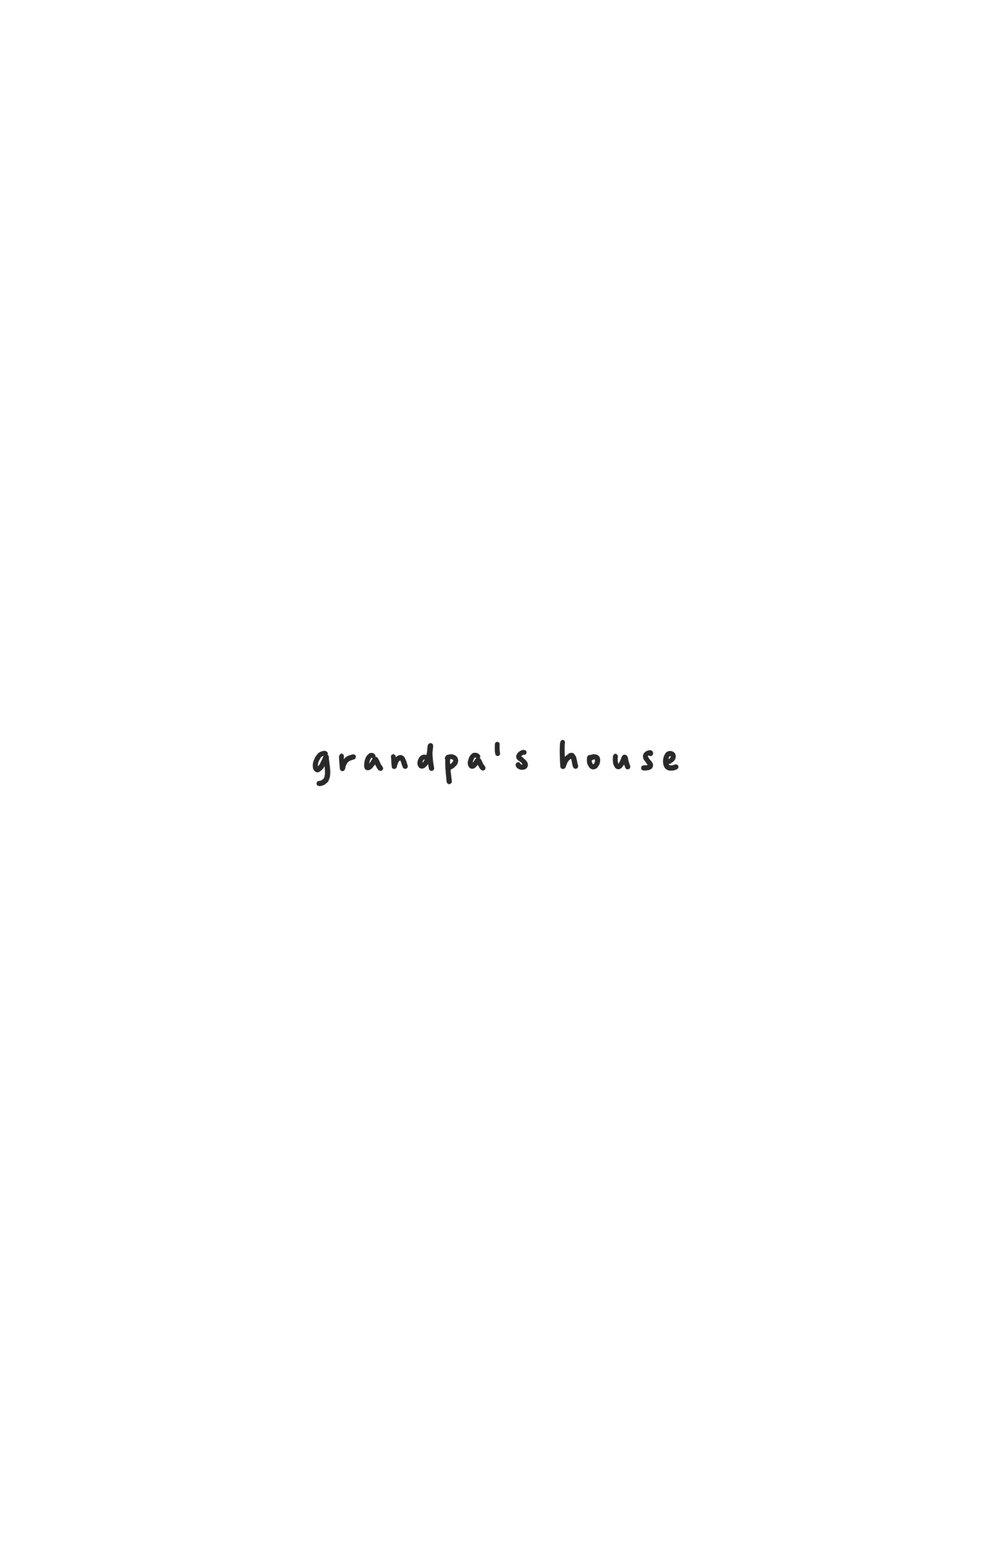 GrandpasHouse_2_Page_03.jpg